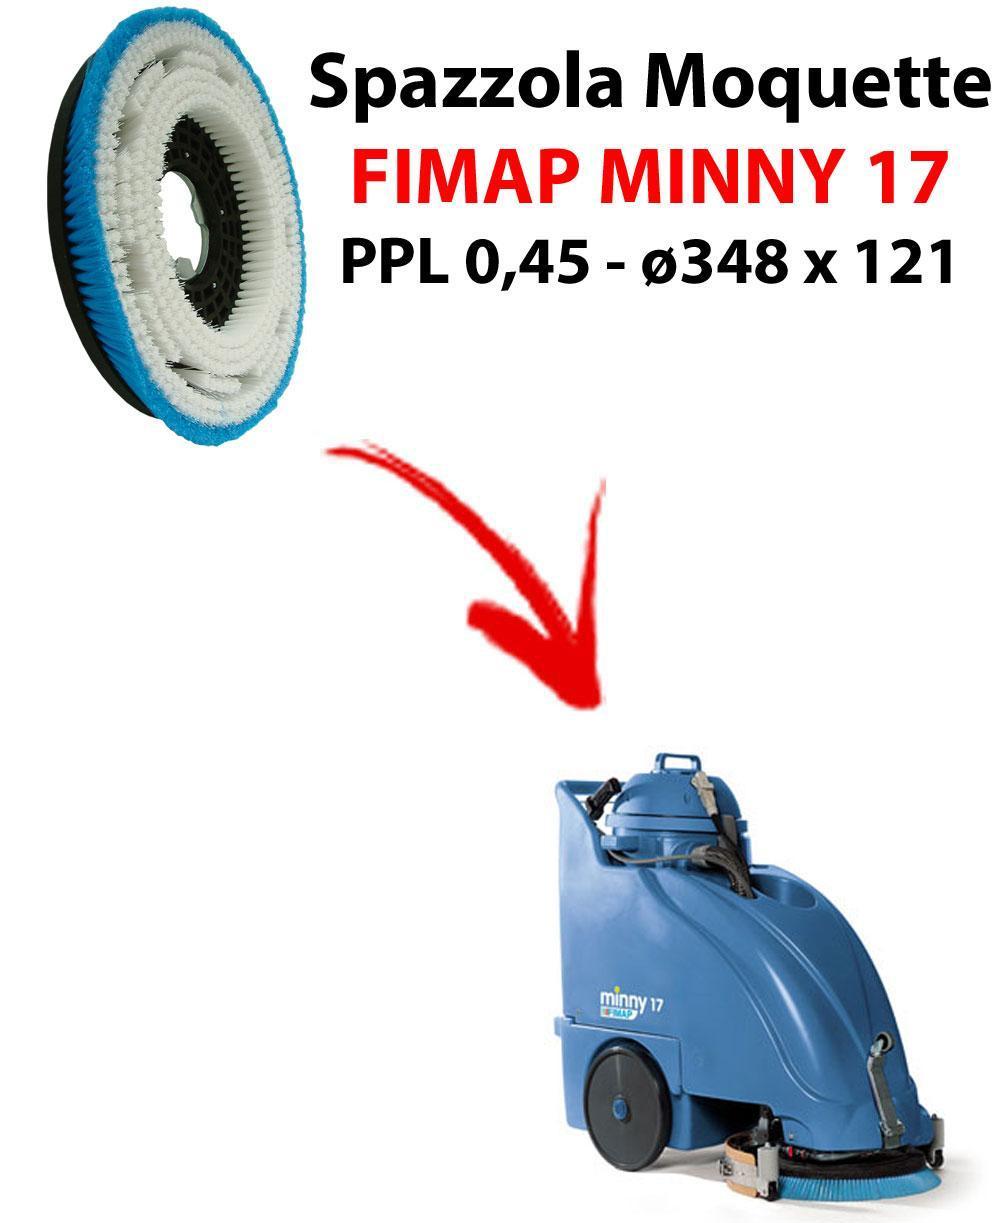 MOQUETTE BRUSH for scrubber dryer FIMAP MINNY 17. Model: PPL 0,45 C/FLANGIA ⌀348 X 121